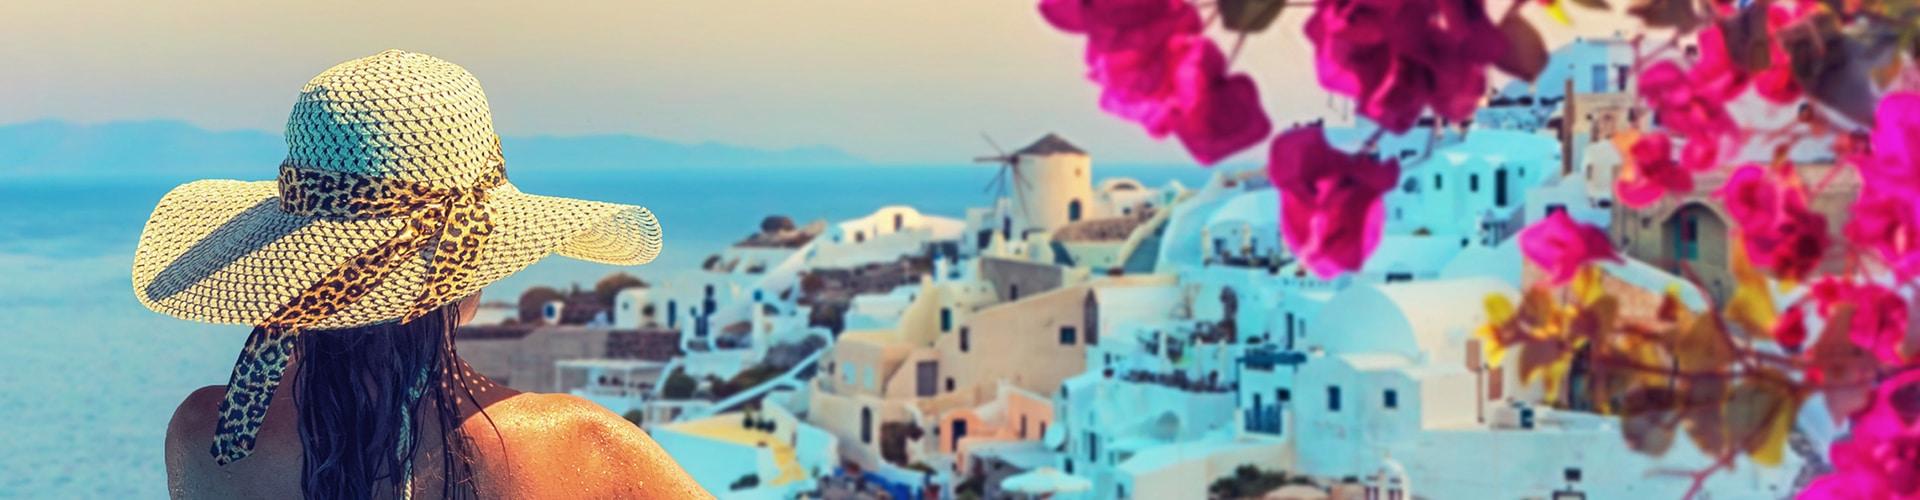 Desire Rome-Athens Cruise